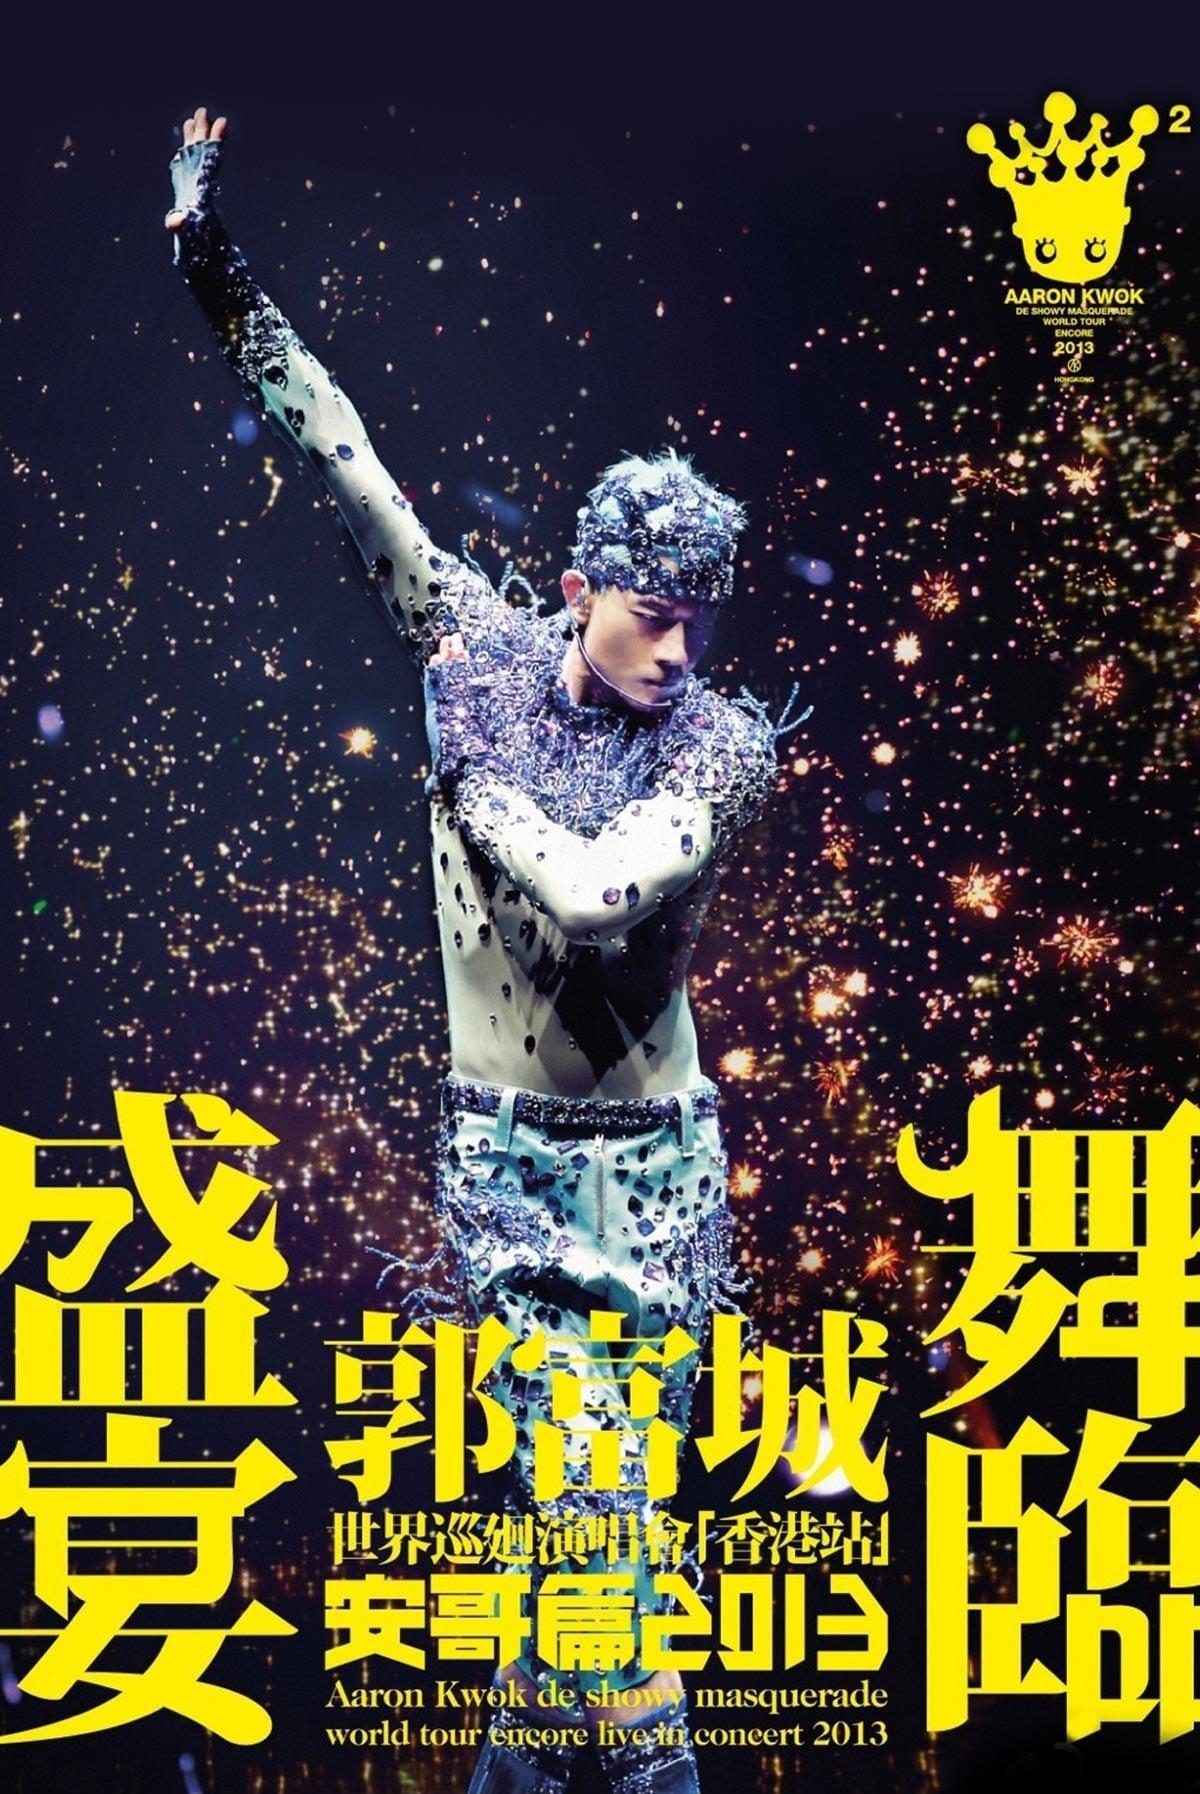 Aaron Kwok de Showy Masquerade World Tour Live in Concert